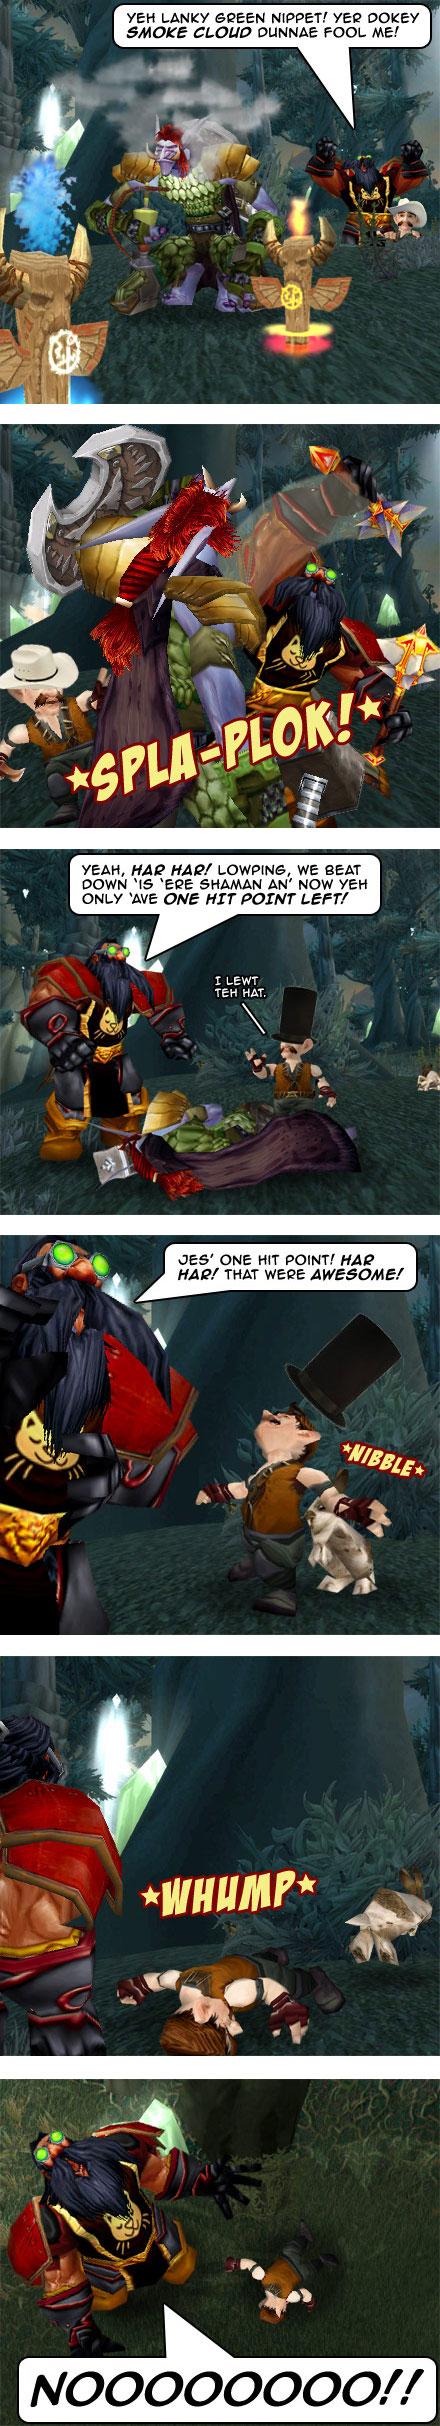 Part 17: Fateful Nibble